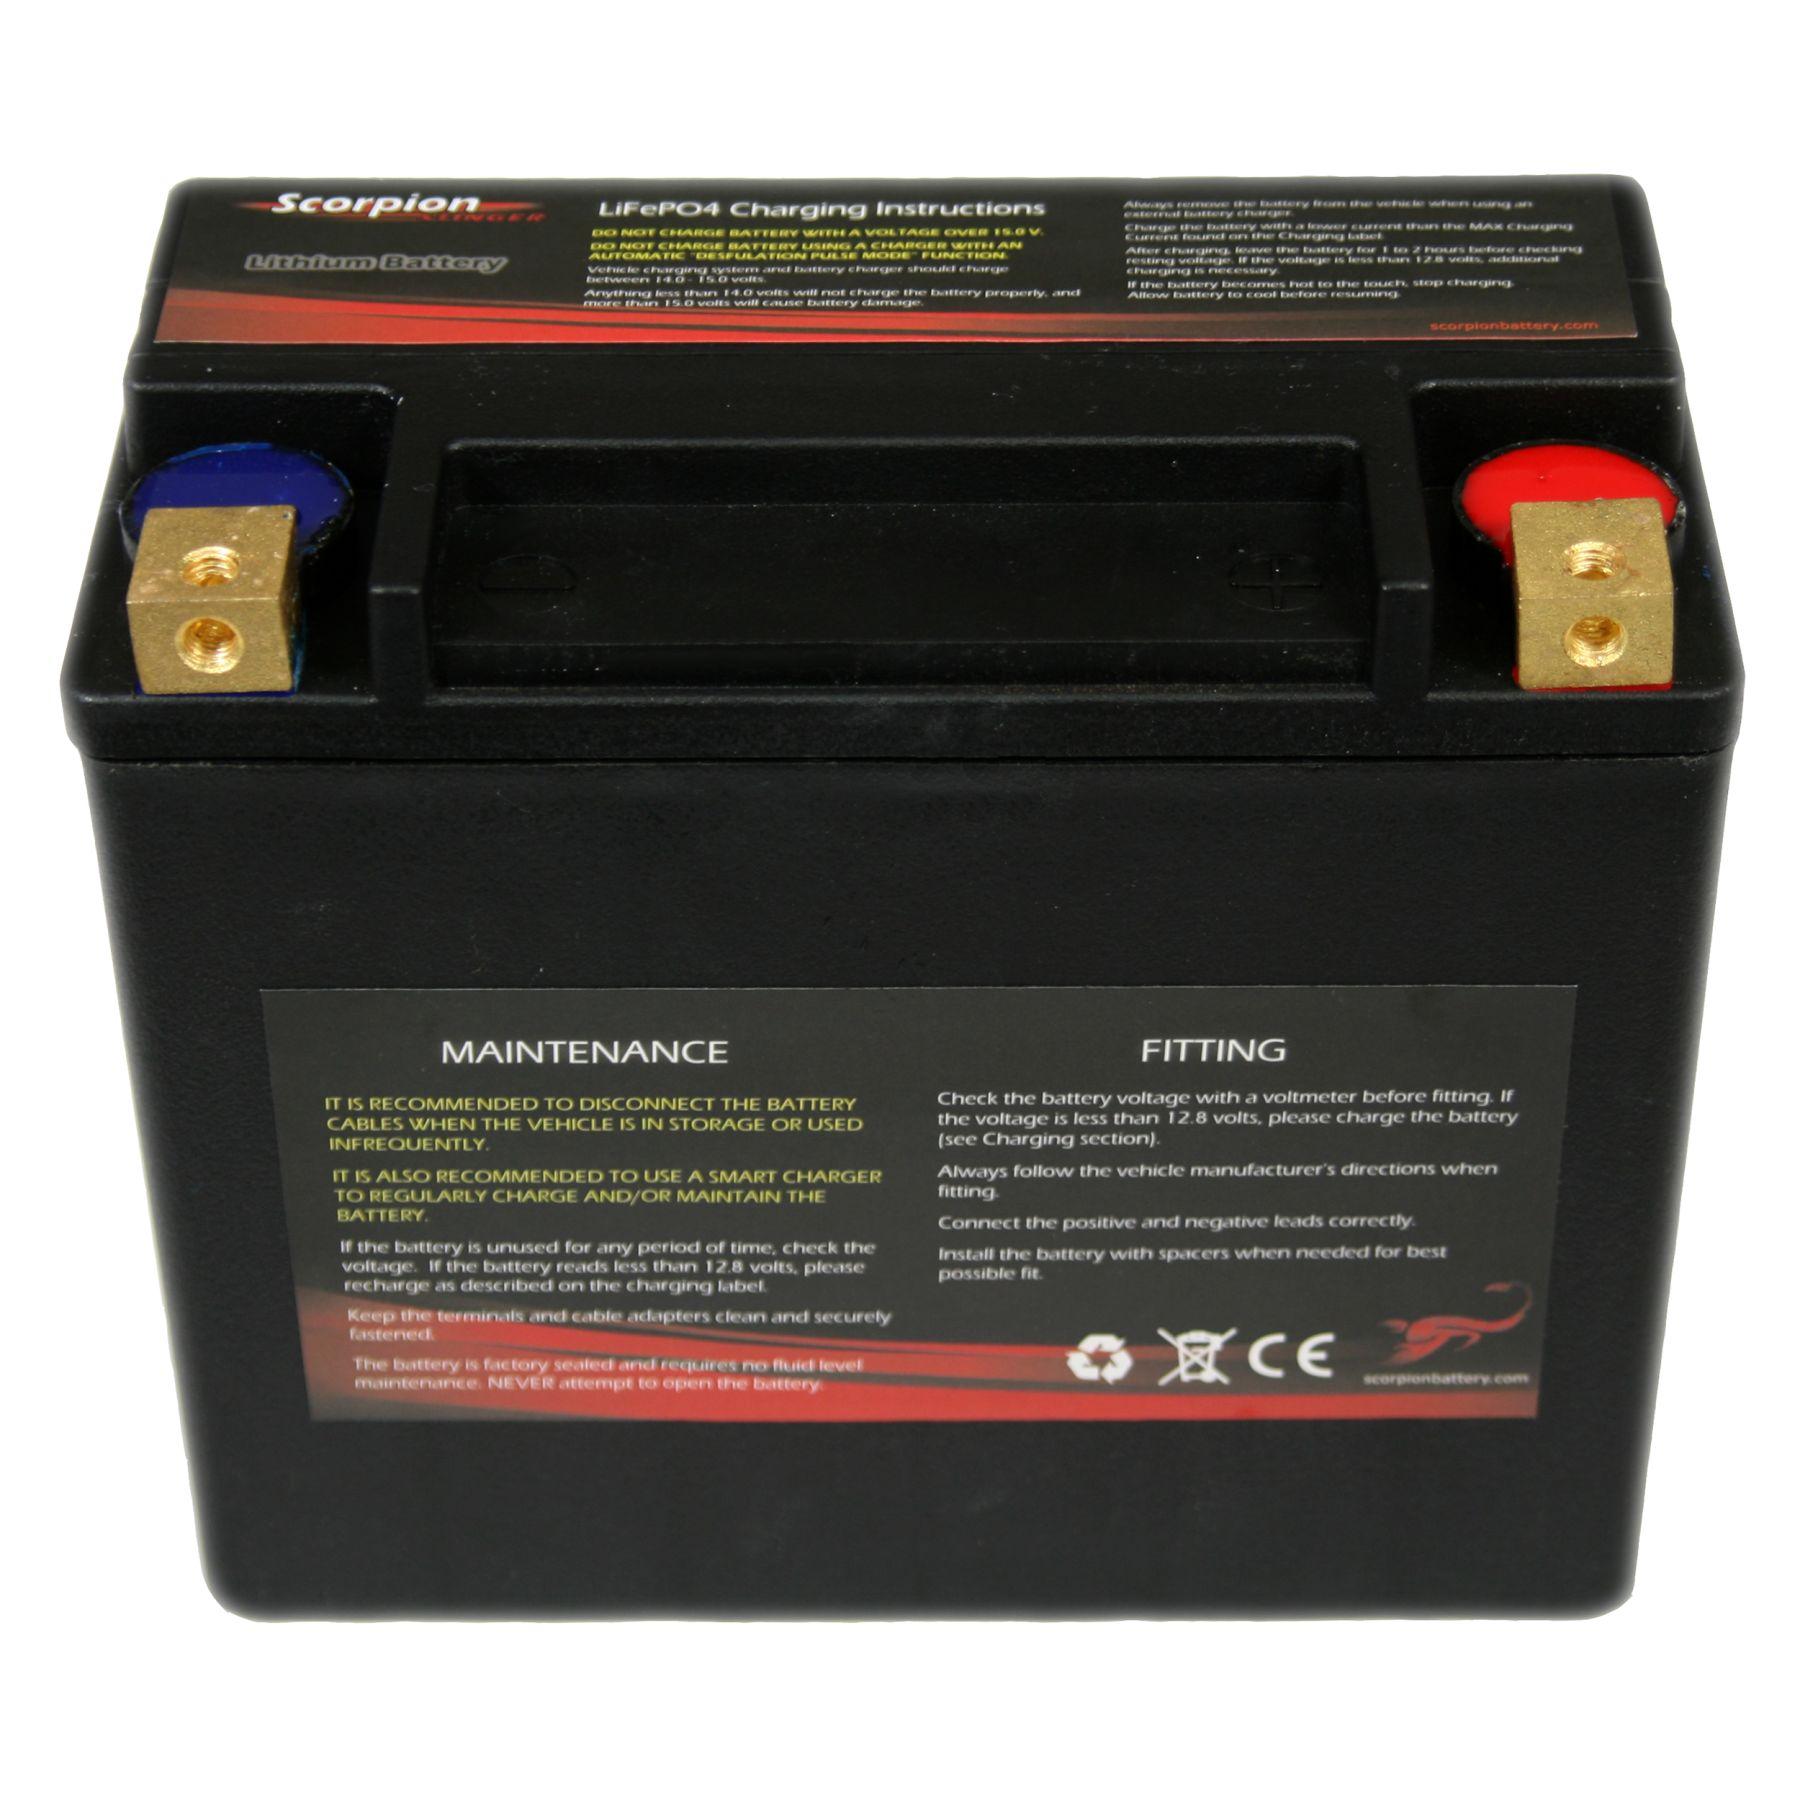 Sshvt 1 Fpp Scorpion Stinger Lithium Lifepo4 Hvt Harley Voltmeter Wiring Diagram Replacement Battery